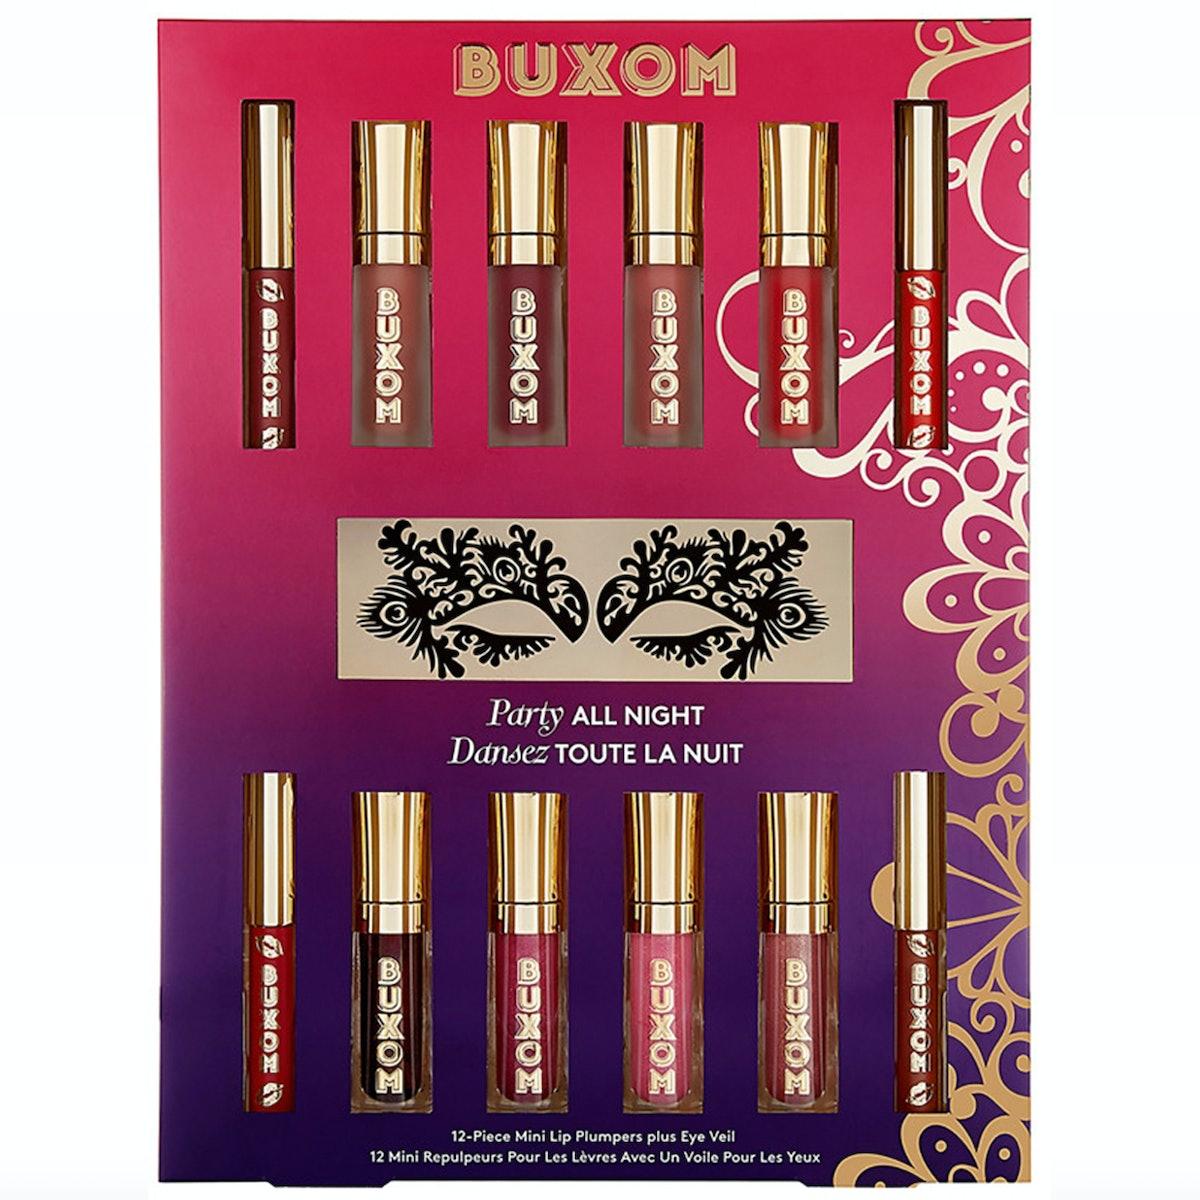 Buxom Party All Night 12-Piece Mini Lip Plumpers Plus Eye Veil